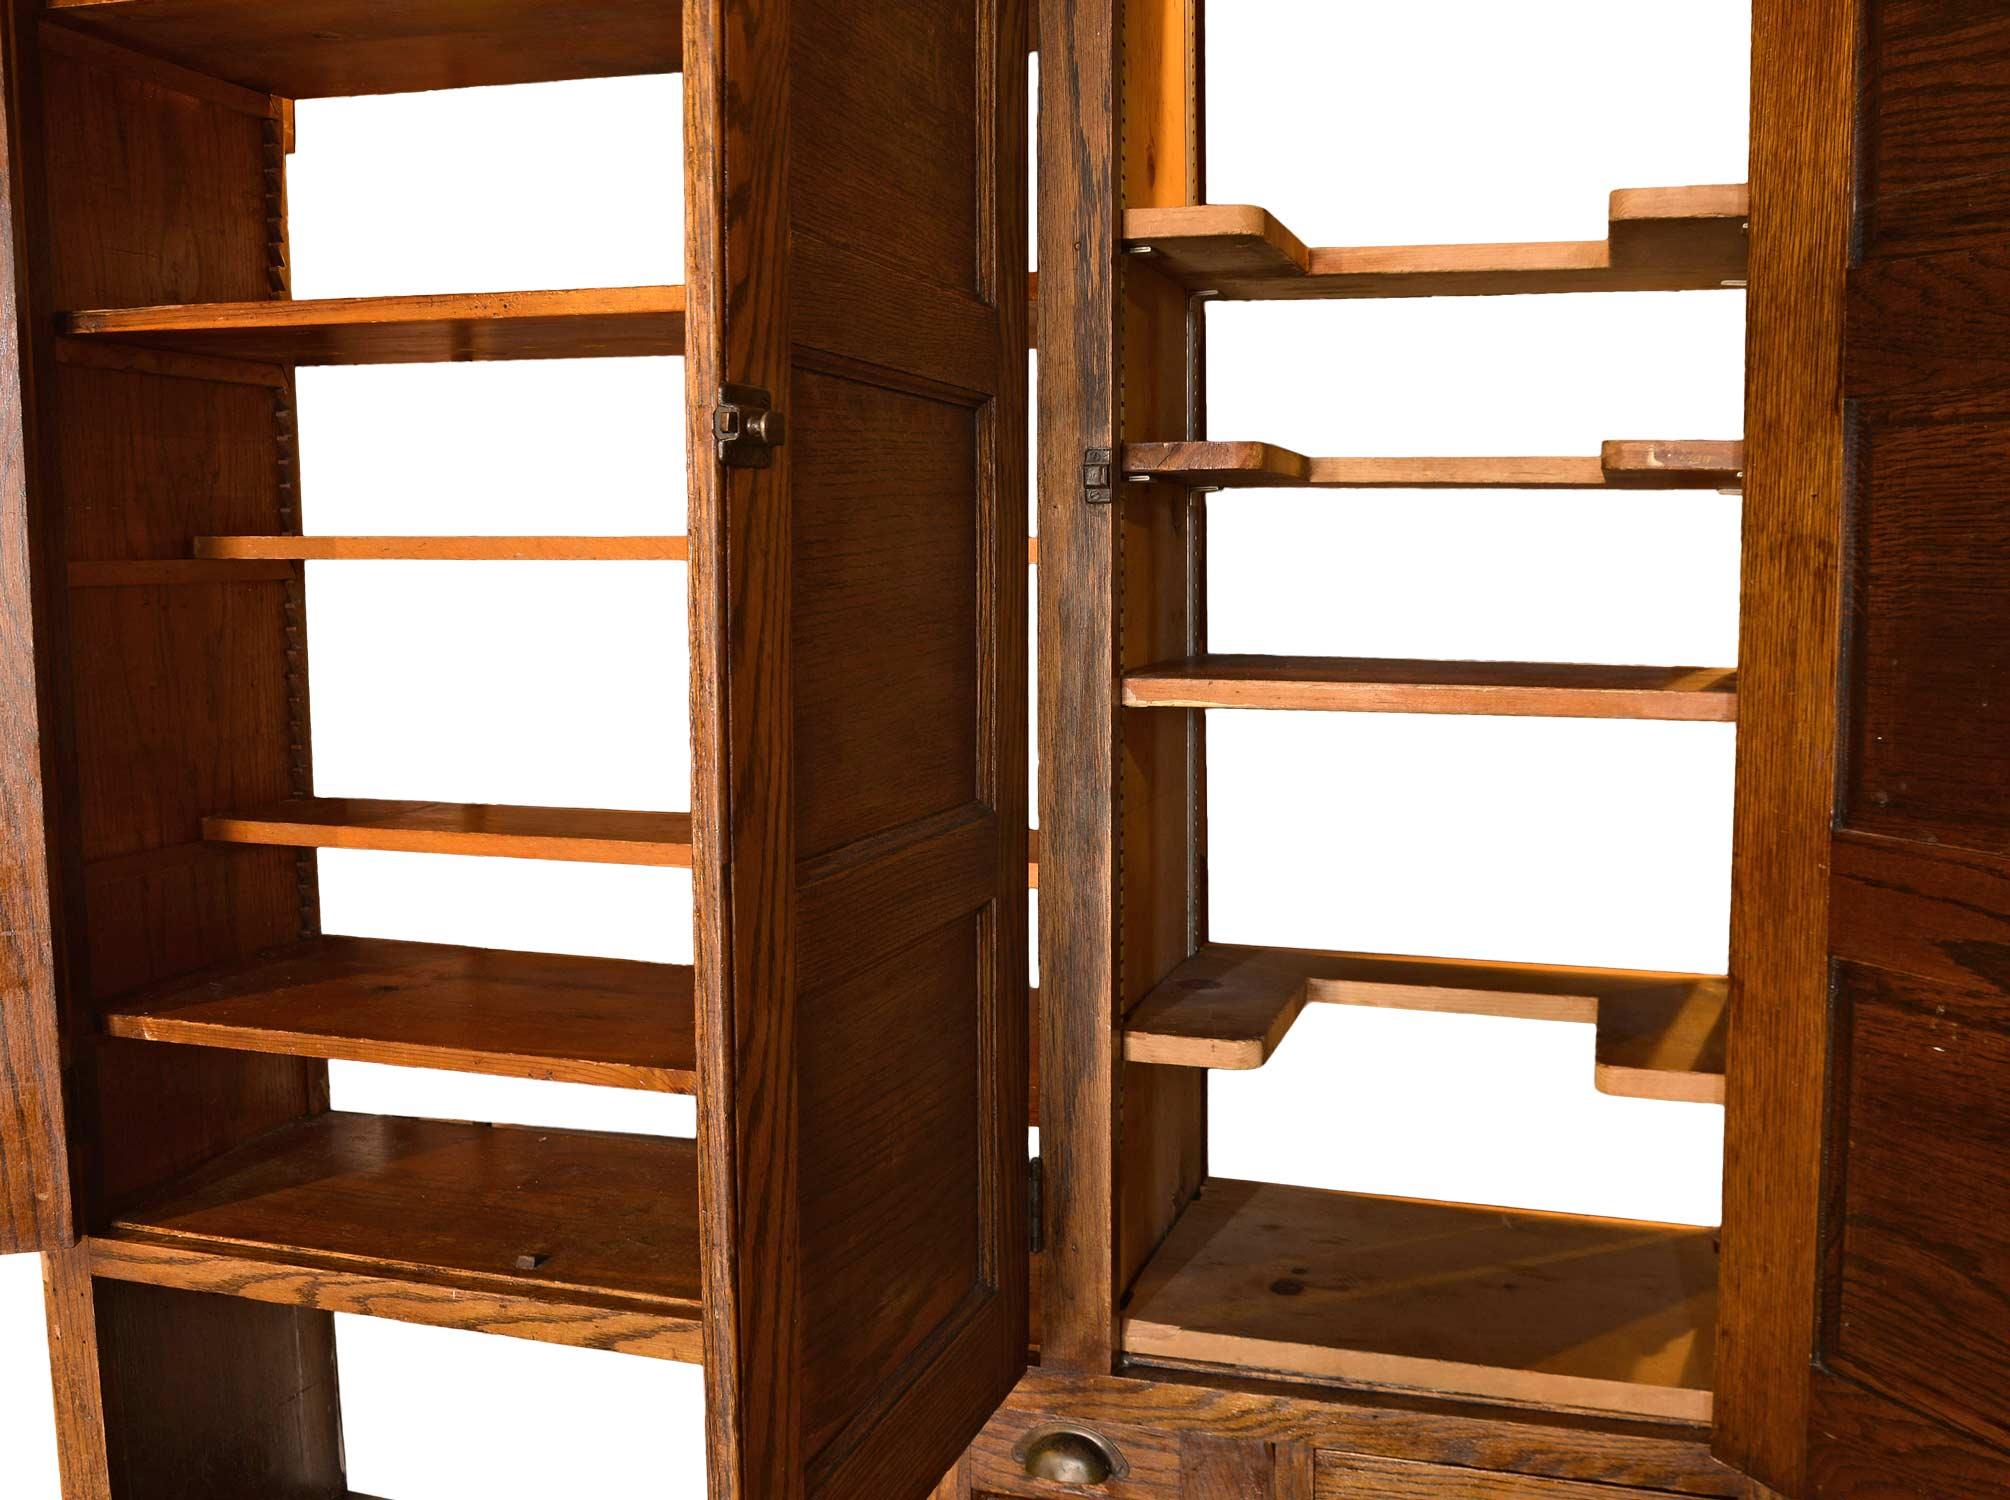 46039-oak-kitchen-cabinet-shelves.jpg